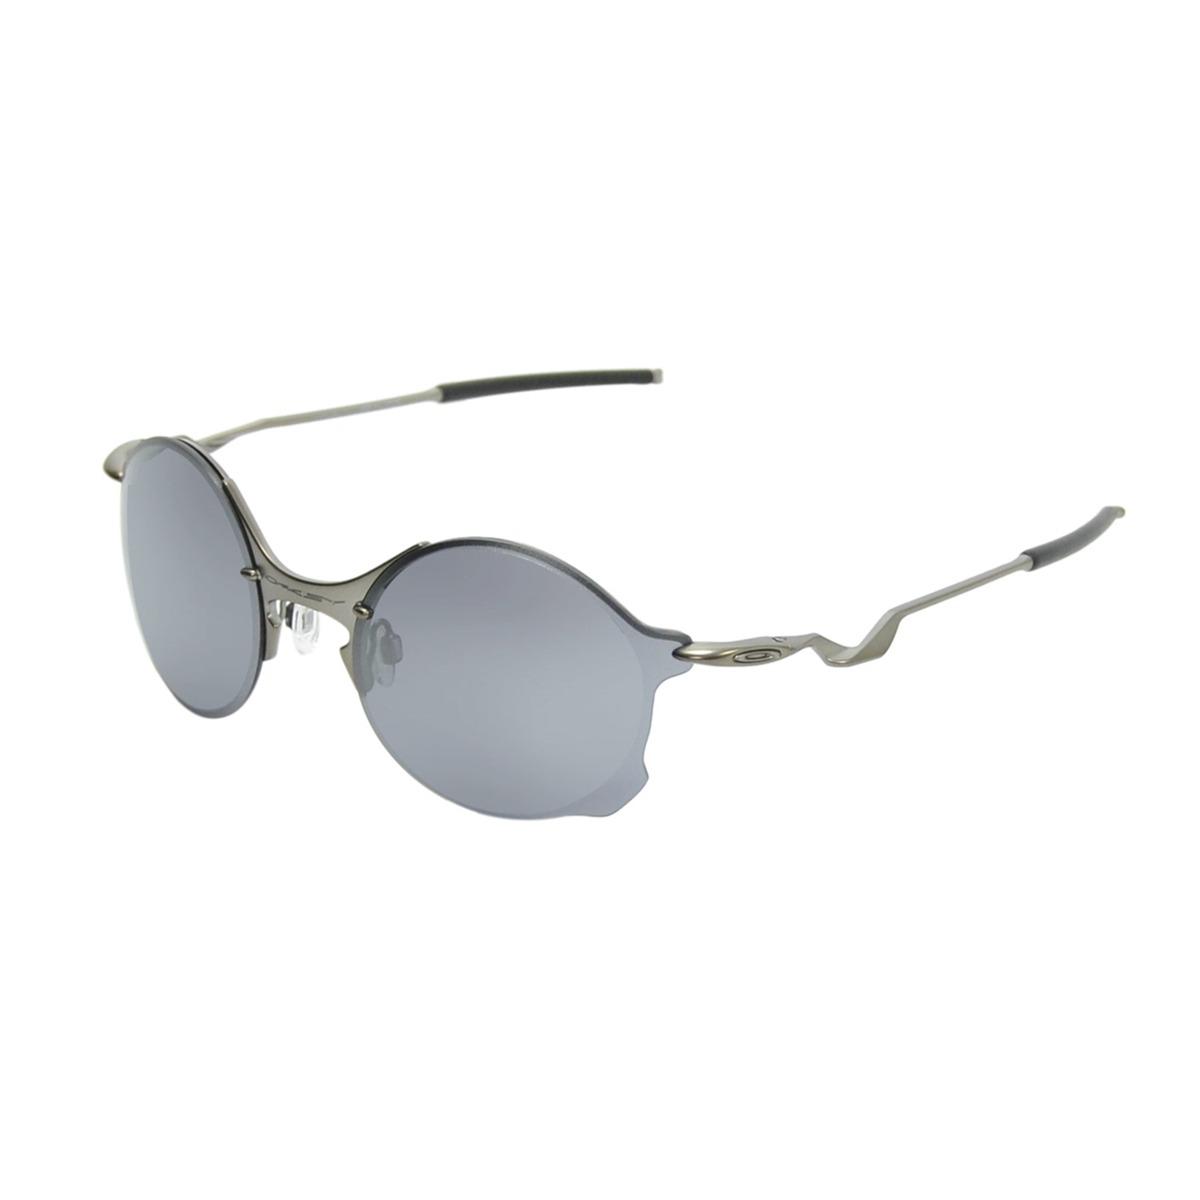 2db15108a4a88 óculos masculino oakley tailend titanium black iridium. Carregando zoom.